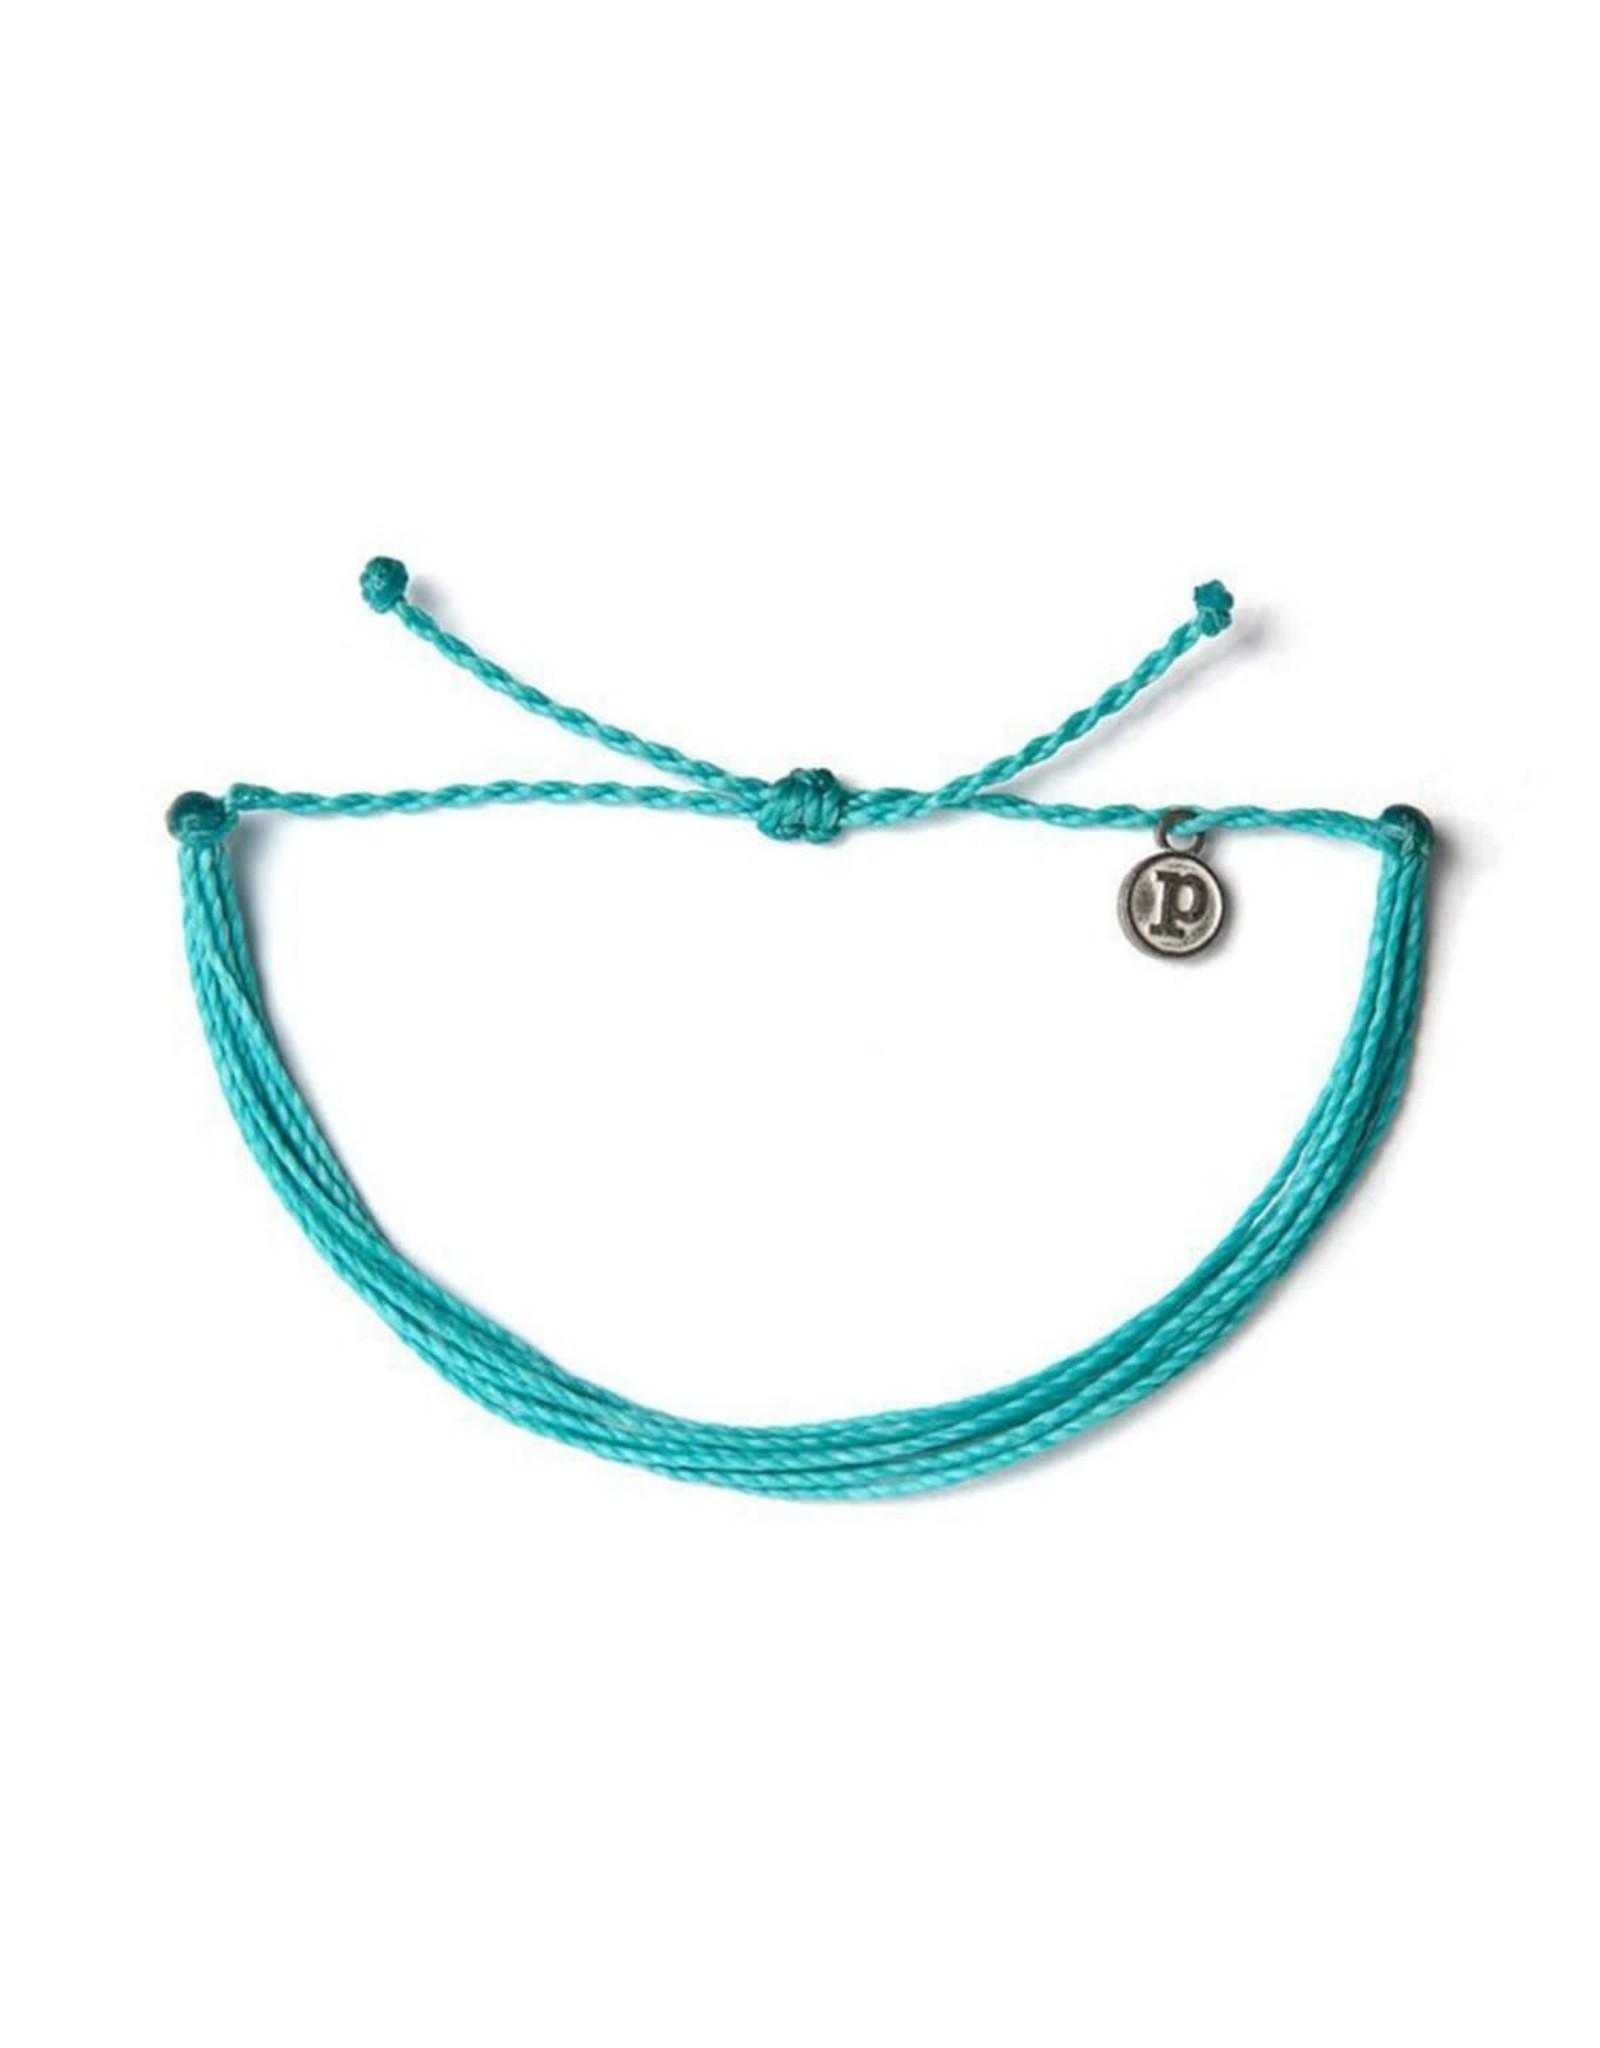 Pura Vida, Original Bracelet, Seafoam Blue